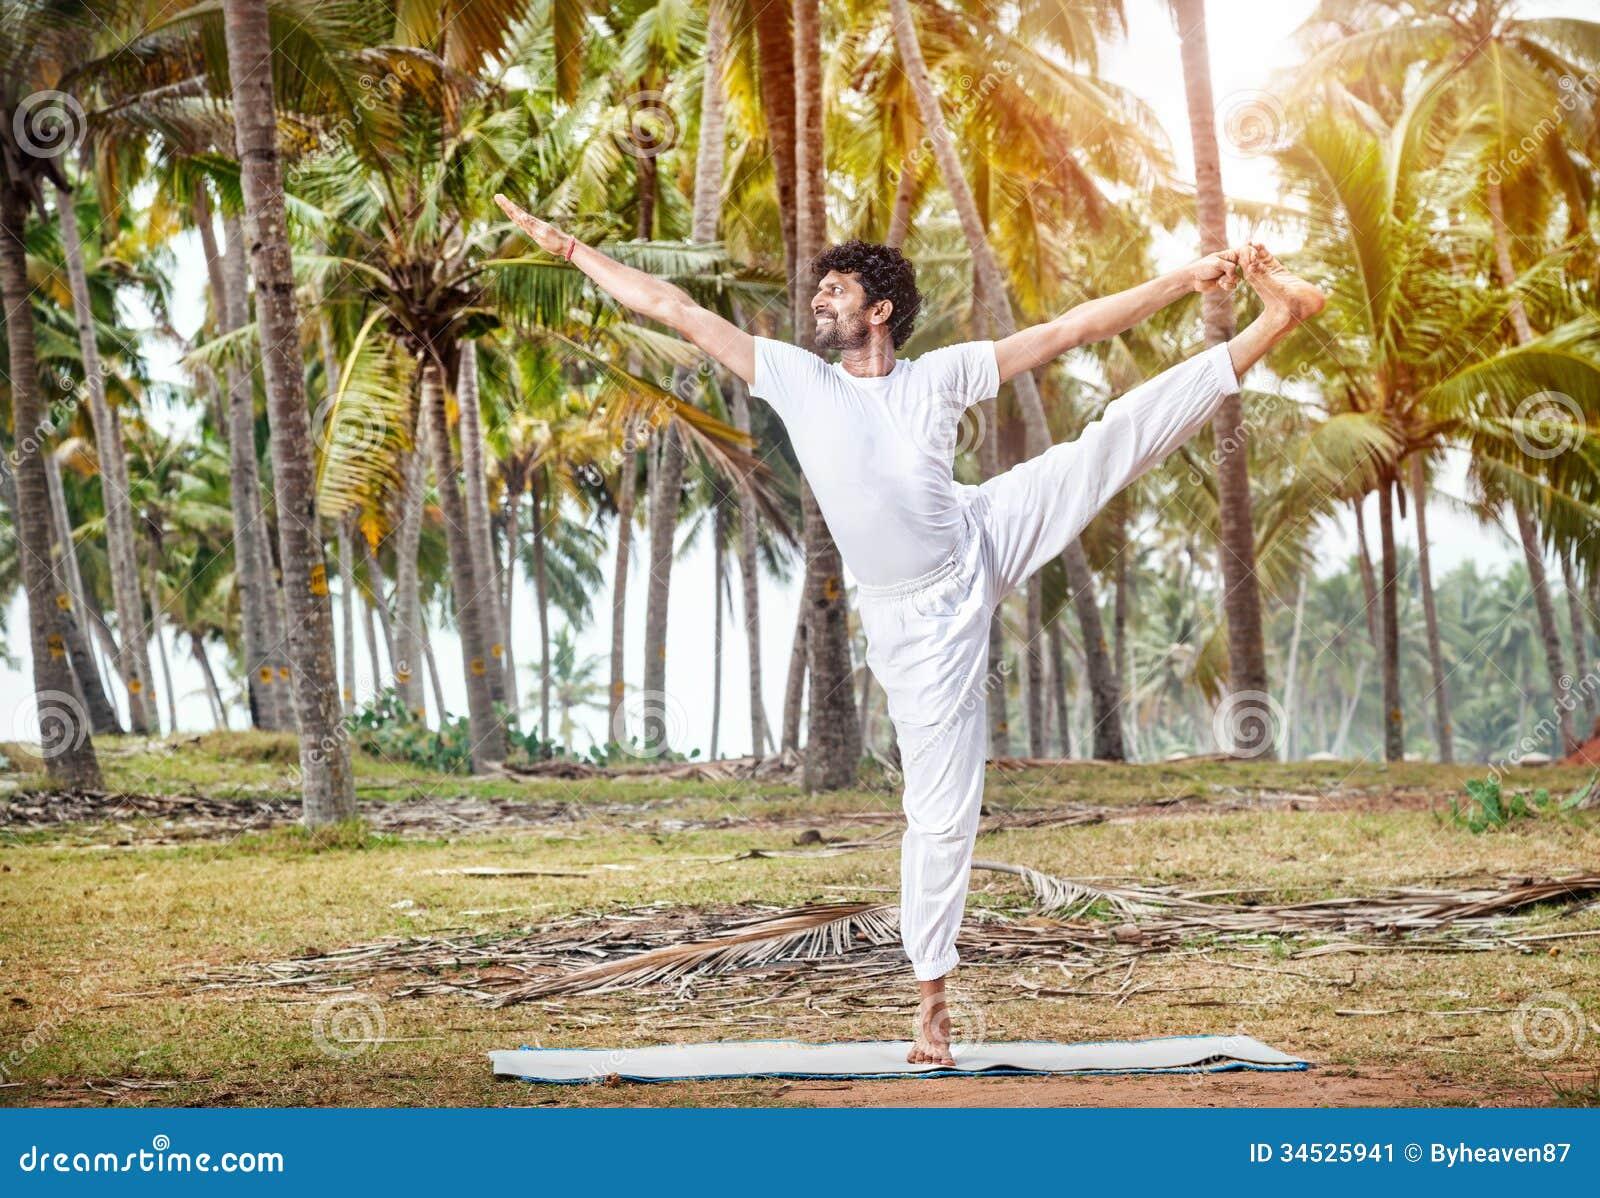 Yoga Meditation Pose Yoga in tropical India...